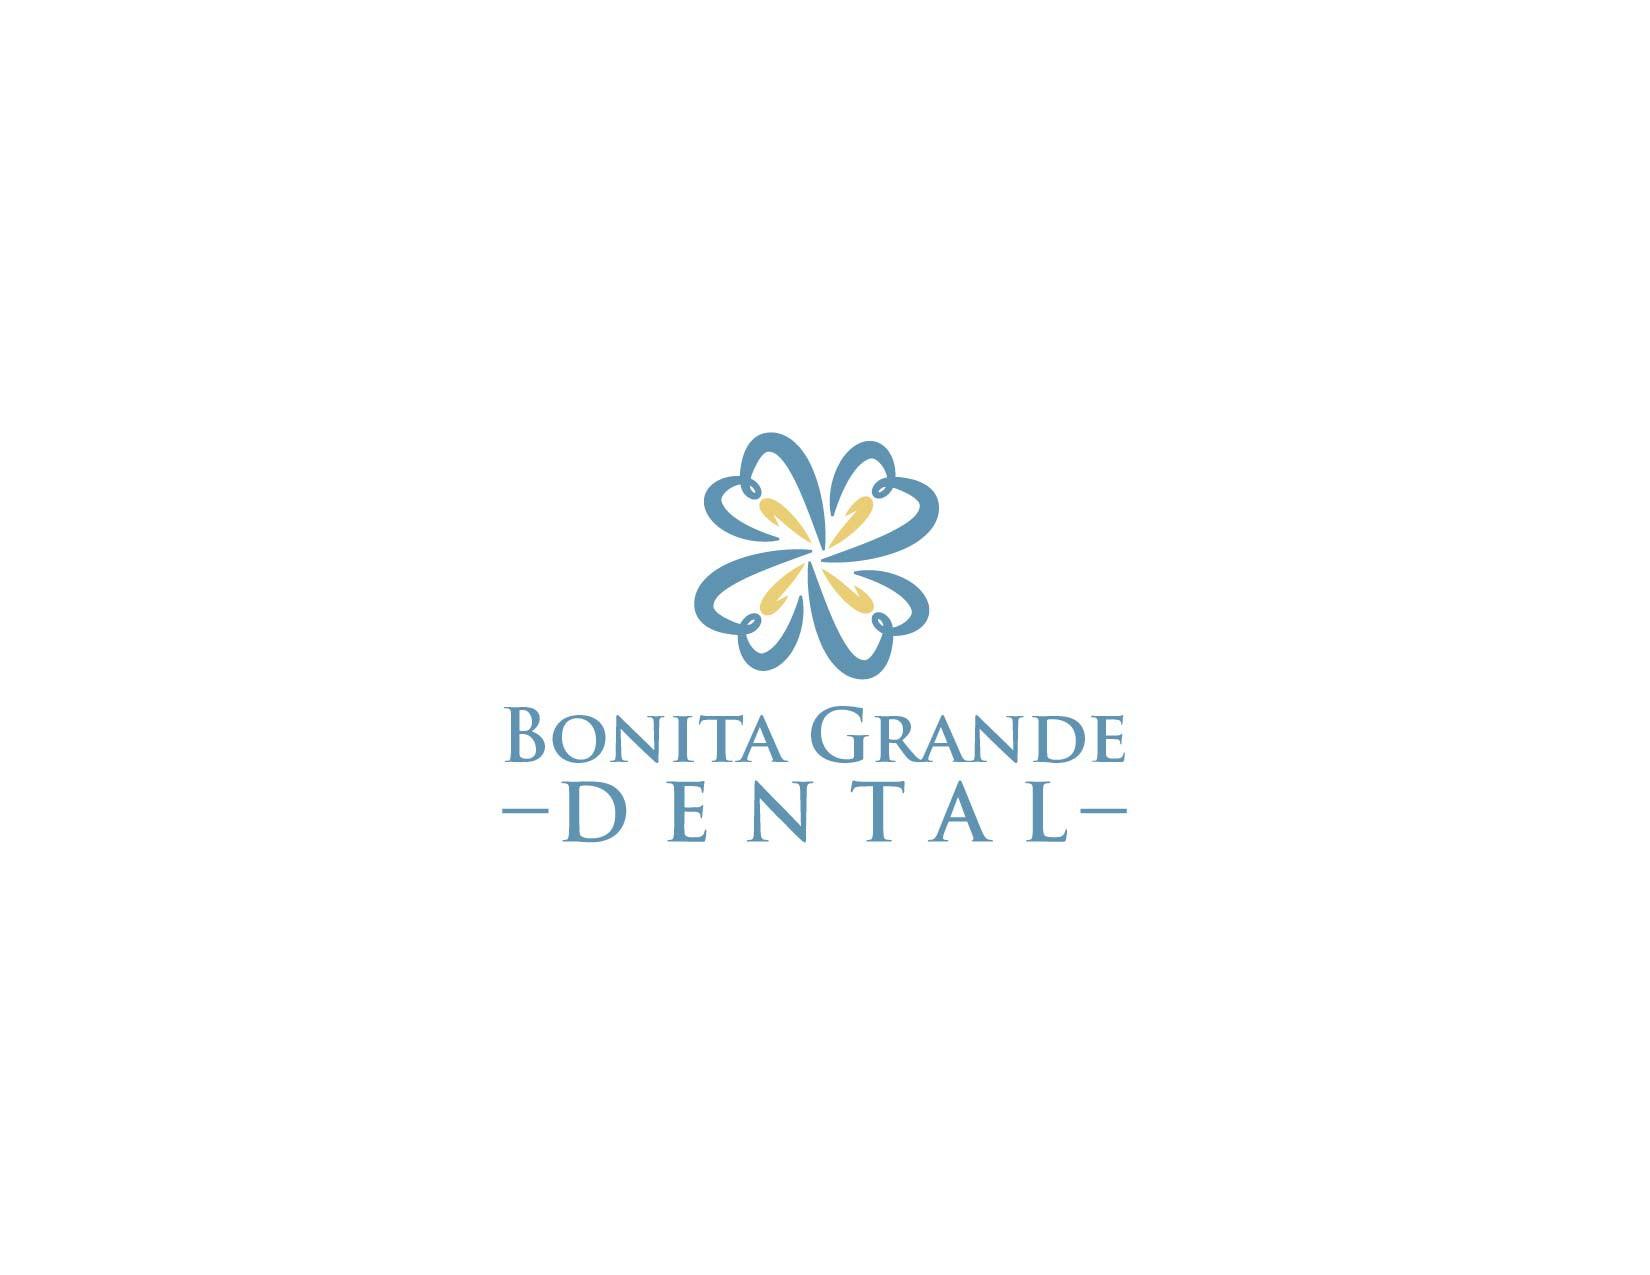 Please design a creative logo for a dental office